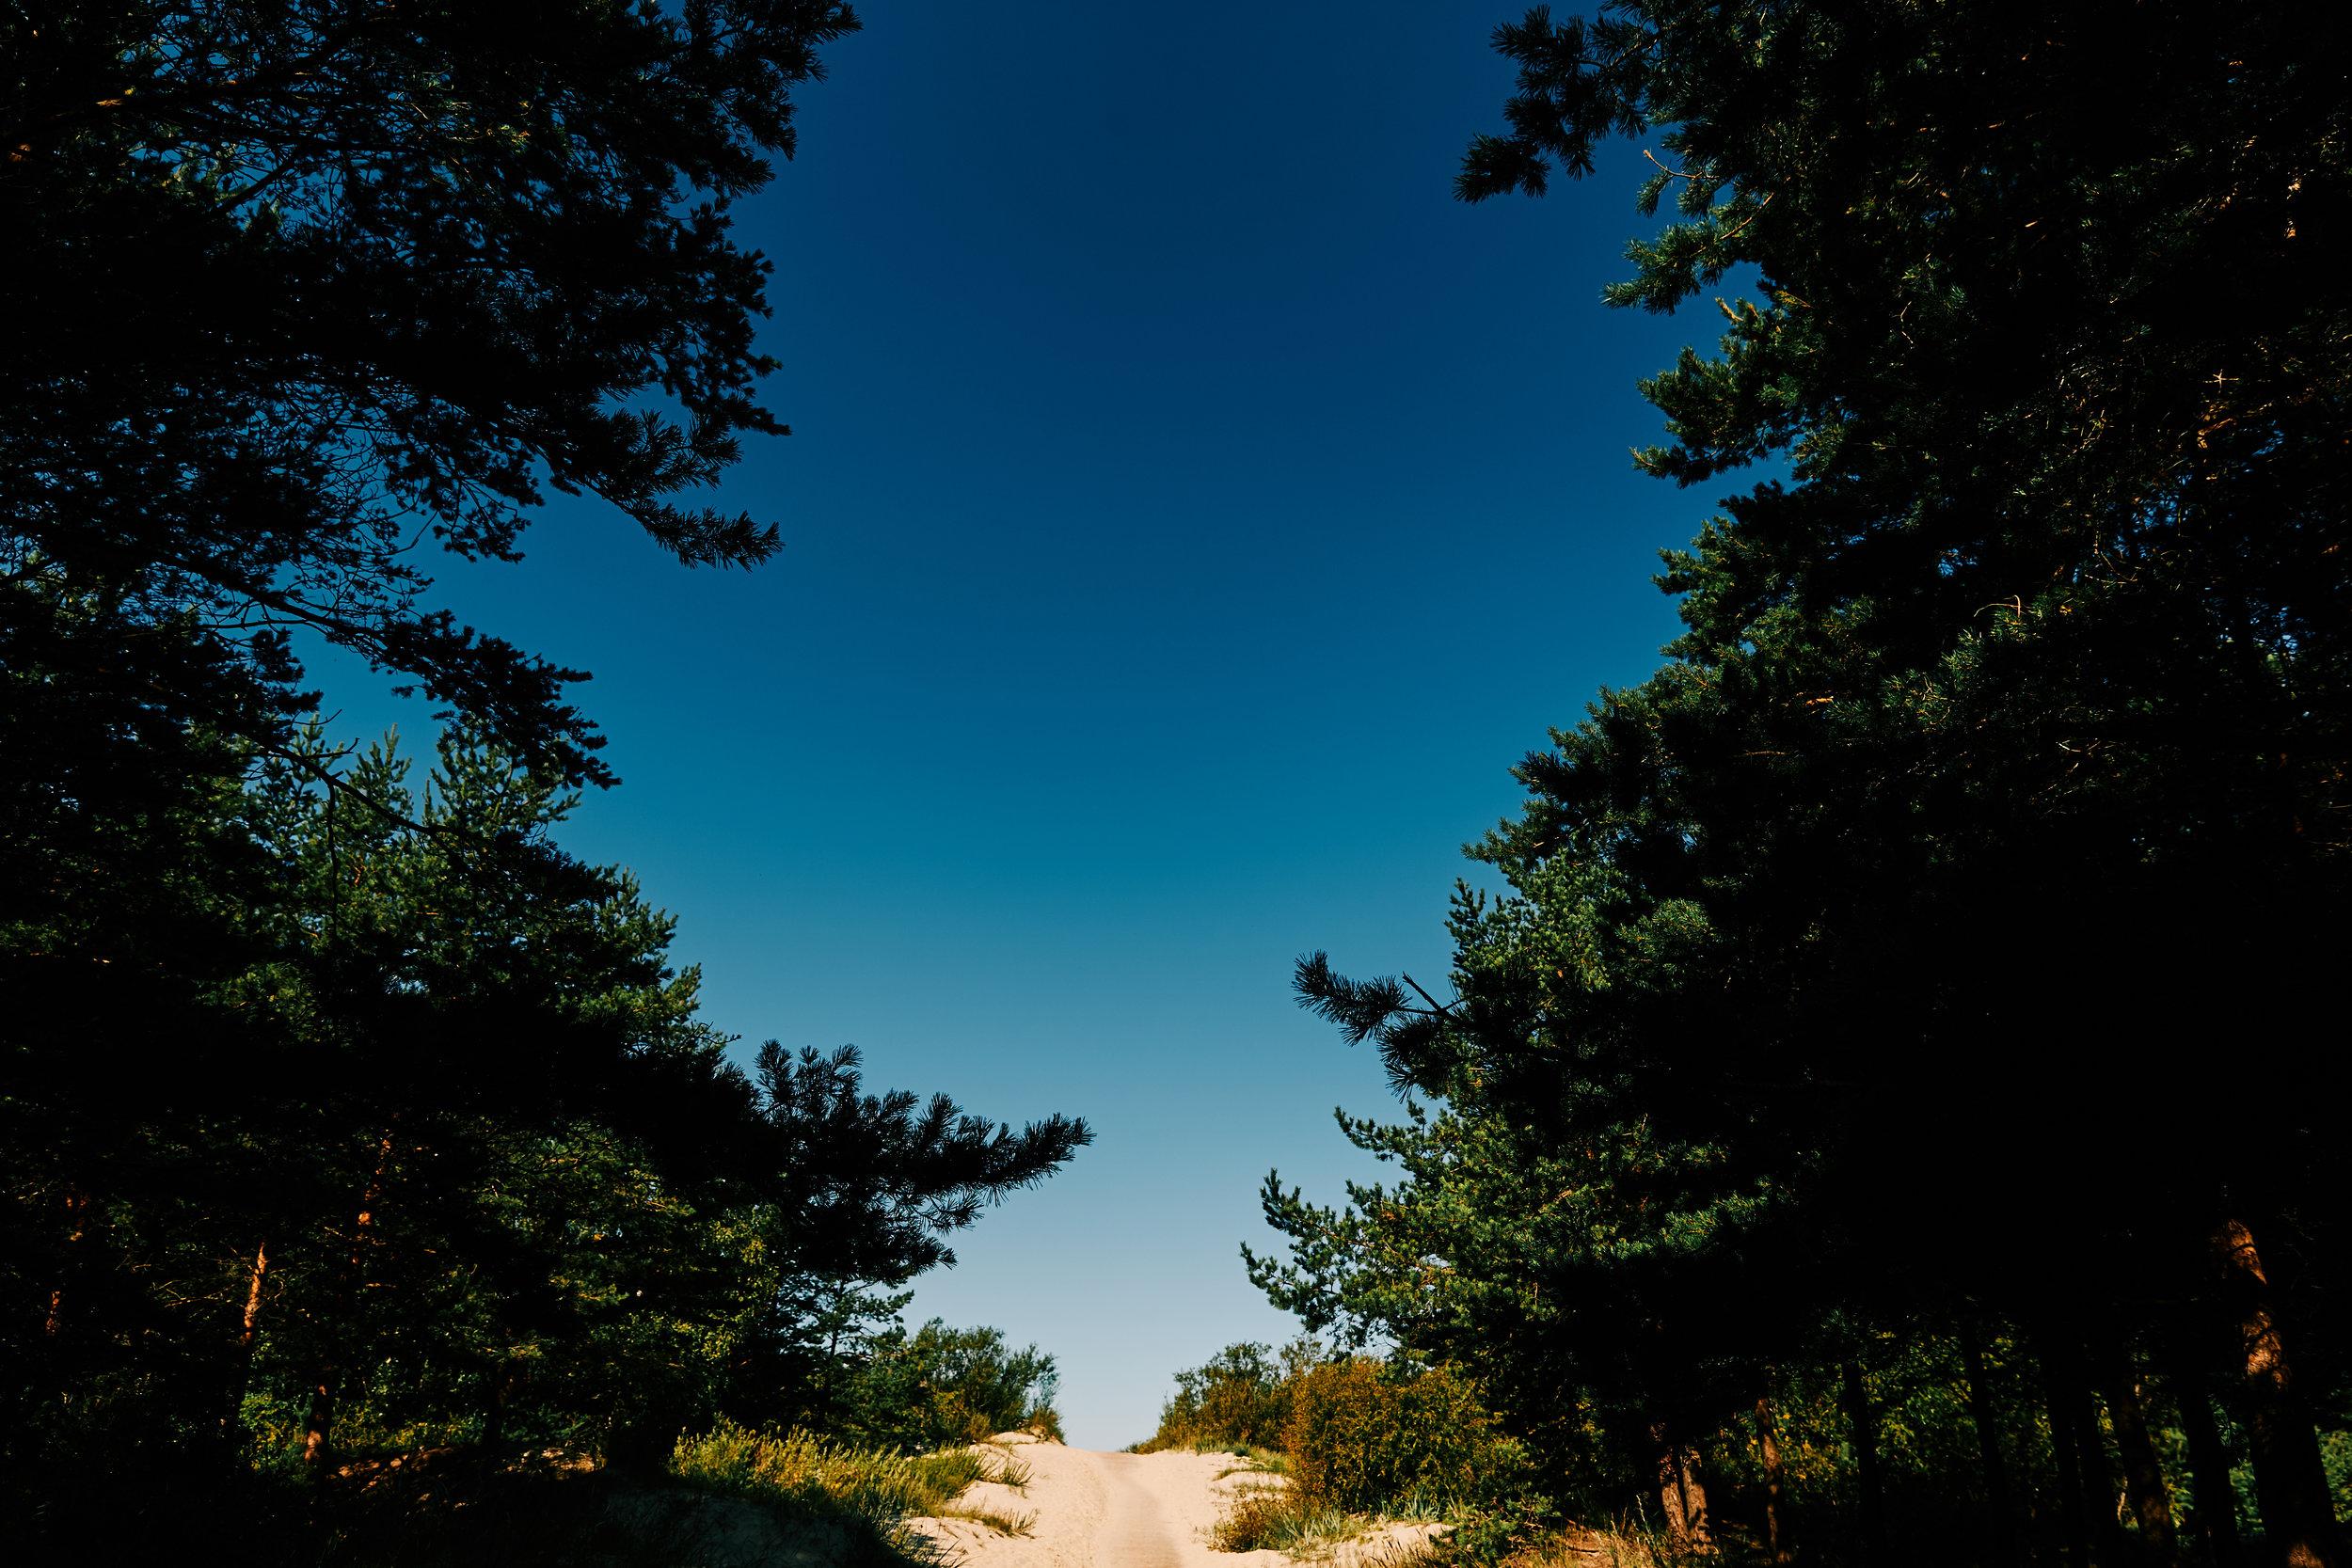 0001 www.skutelisfoto.com.jpg